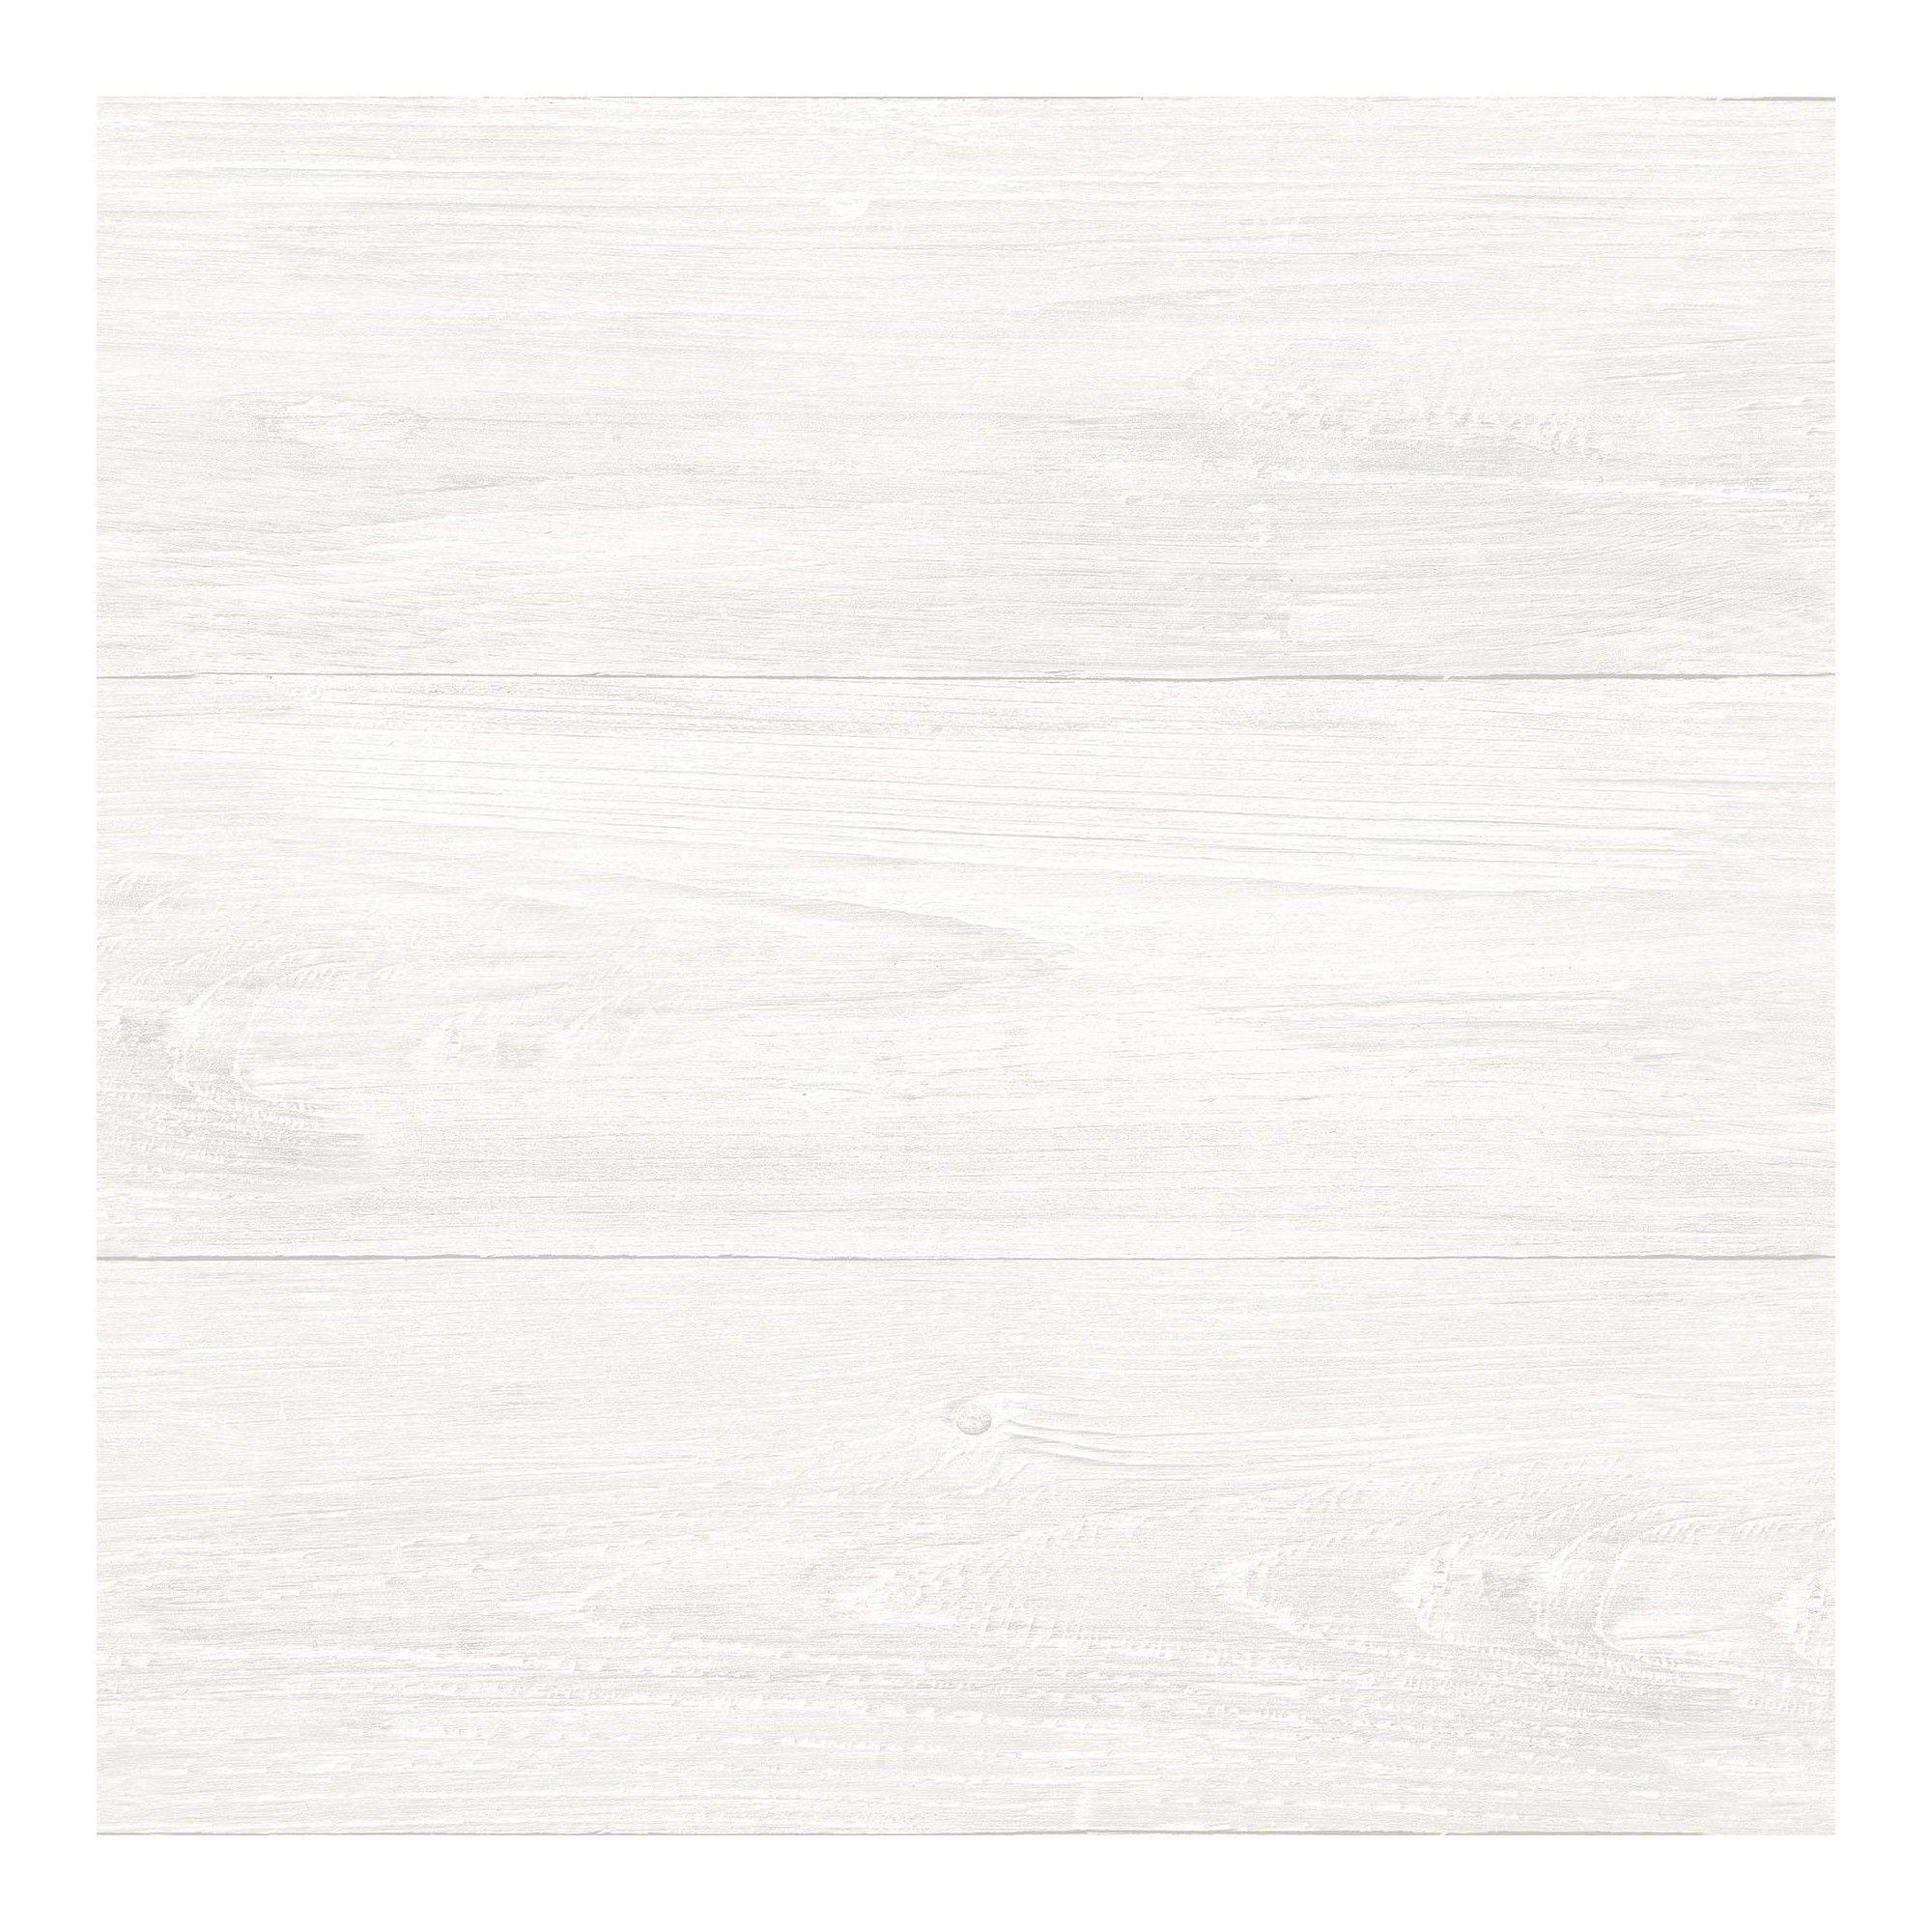 Nuwallpaper Reclaimed Shiplap Peel Stick Wallpaper White Nuwallpaper Peel And Stick Shiplap Peel And Stick Wallpaper